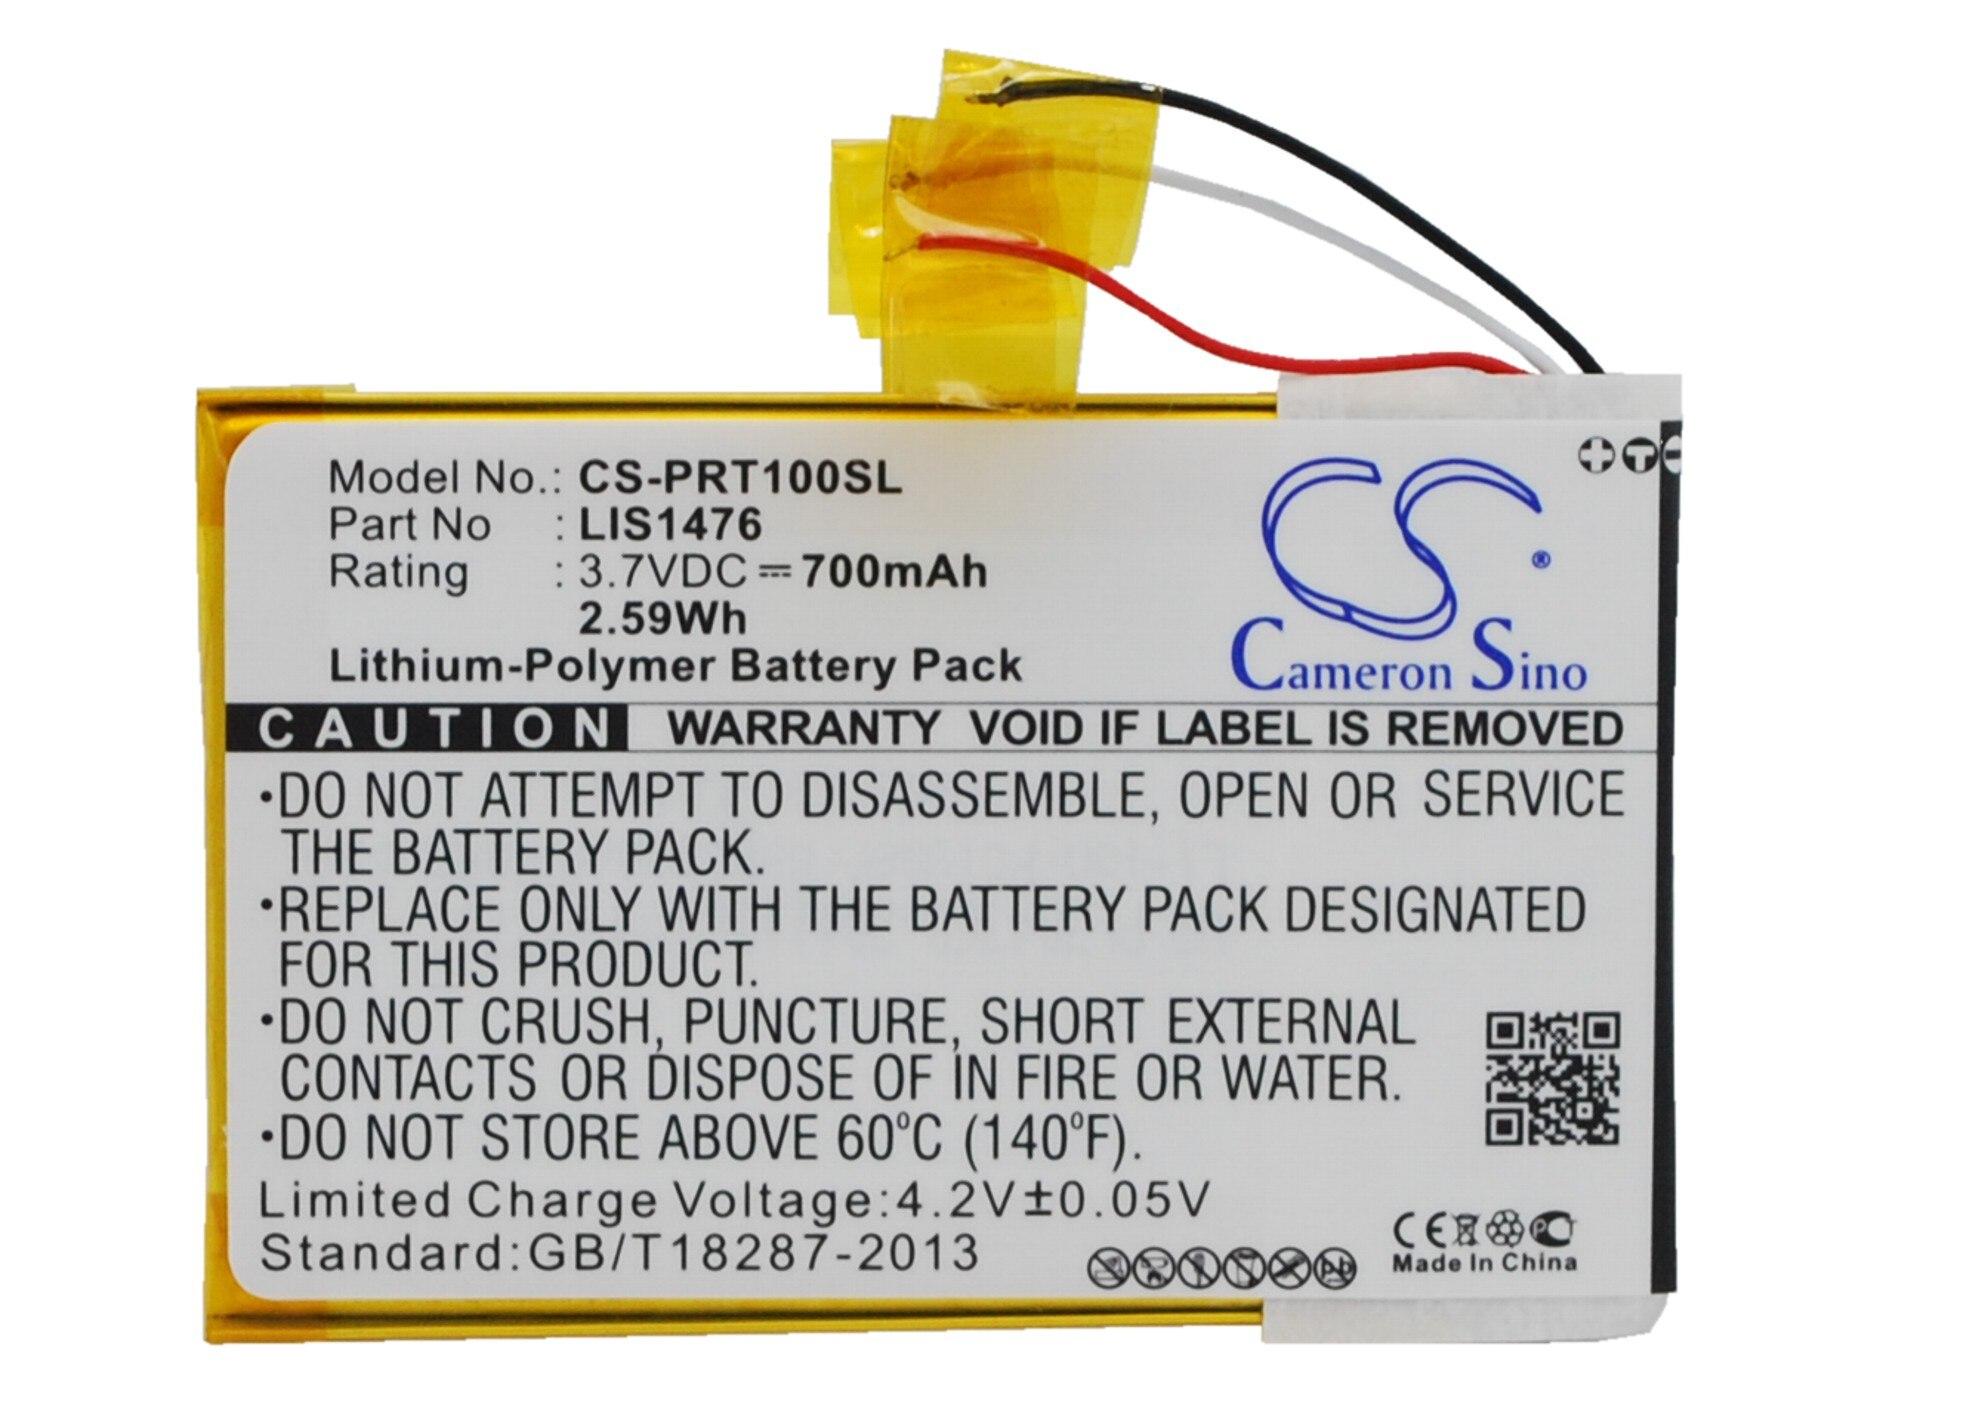 Cameron Sino 700 mAh batterie 1-853-104-11, LIS1476, LIS1476MHPPC (SY6) pour Sony PRS-T1, PRS-T2, PRS-T3, PRS-T3E, PRS-T3S